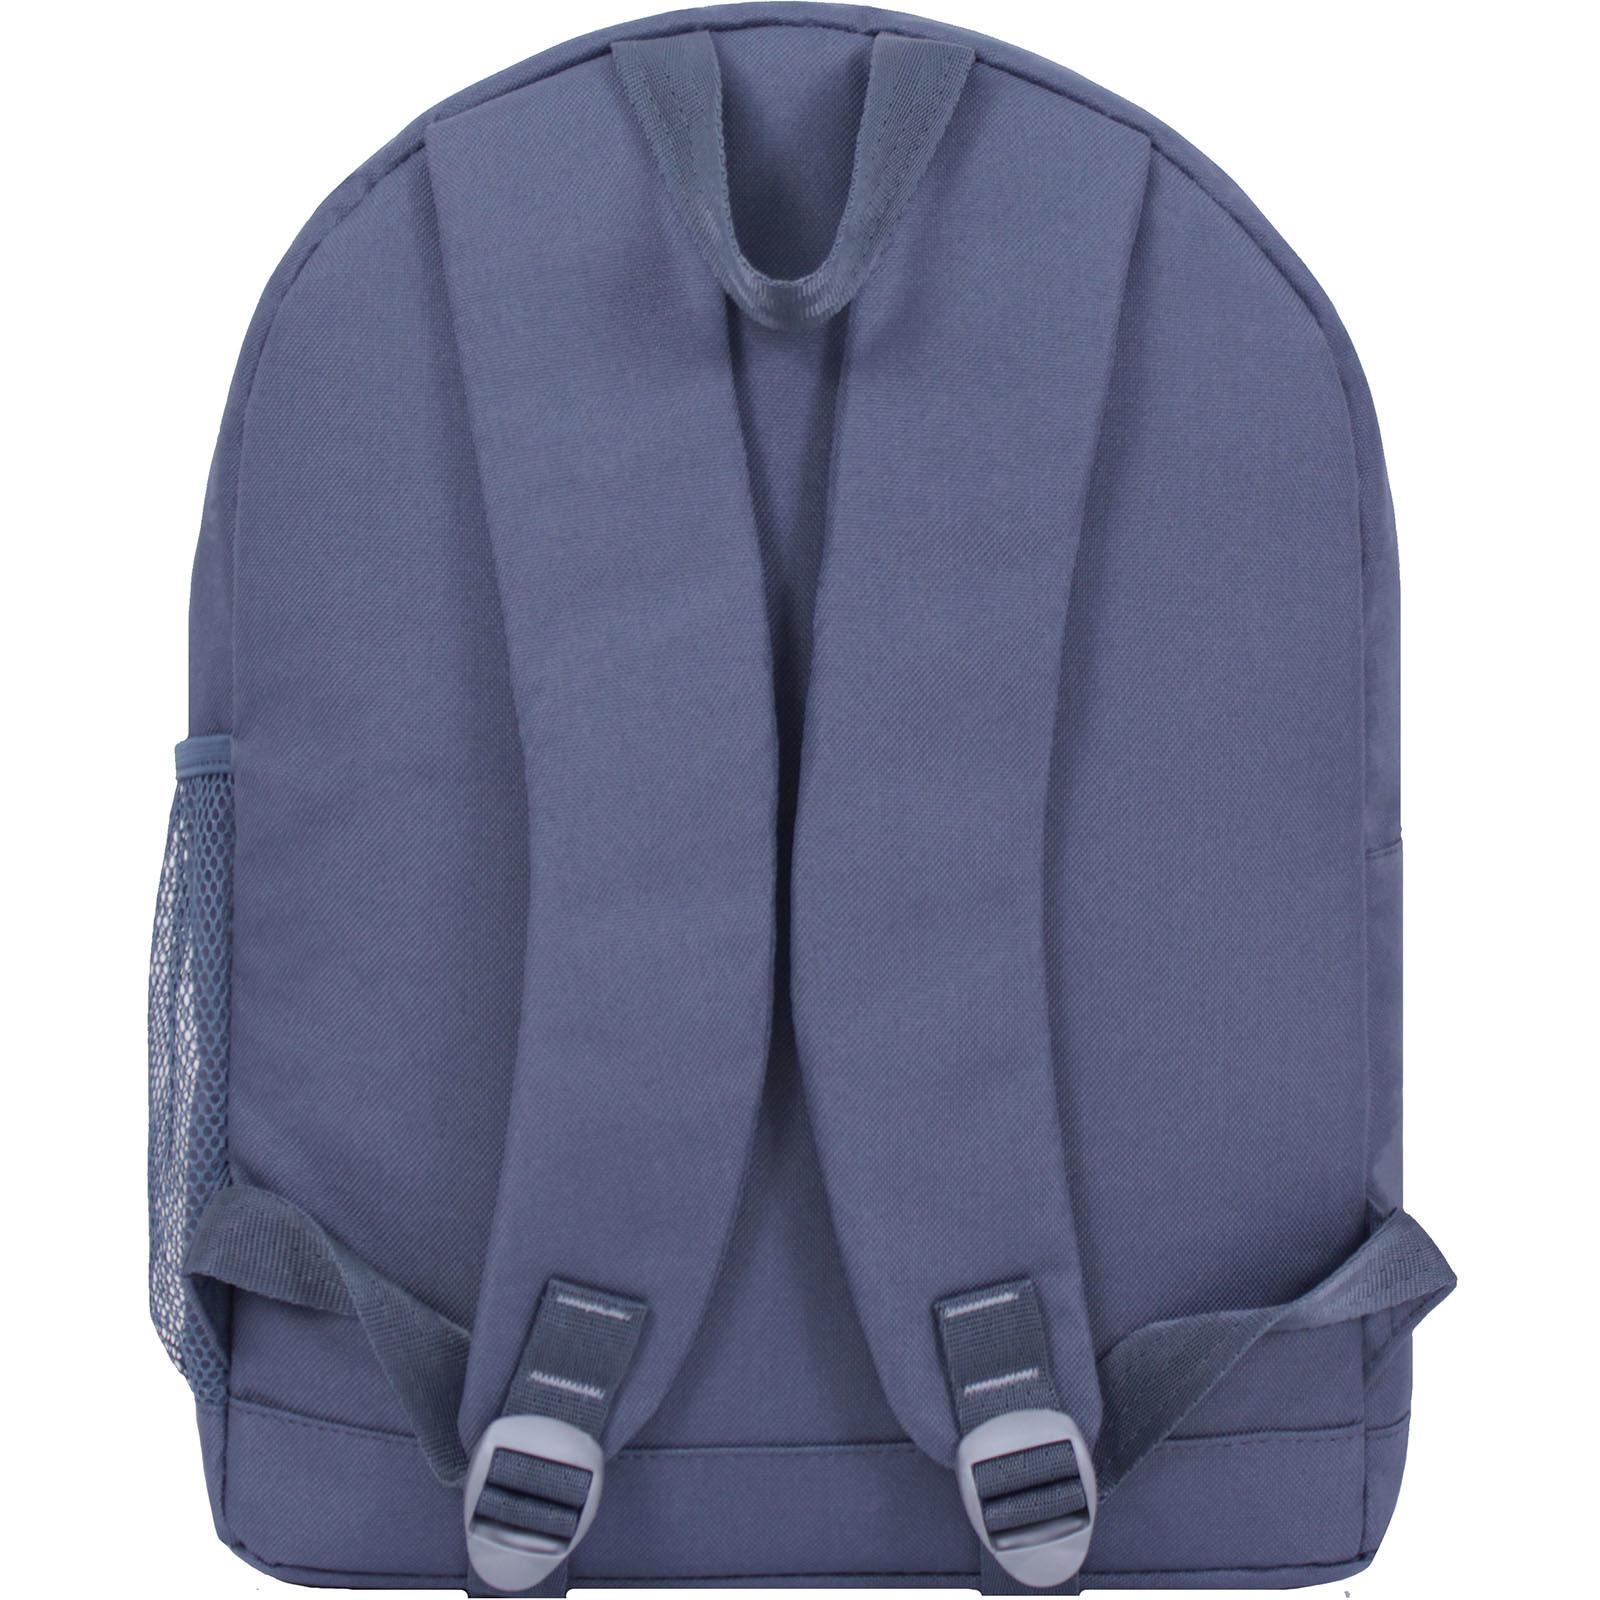 Рюкзак Bagland Молодежный W/R 17 л. серый 473 (00533662) фото 3